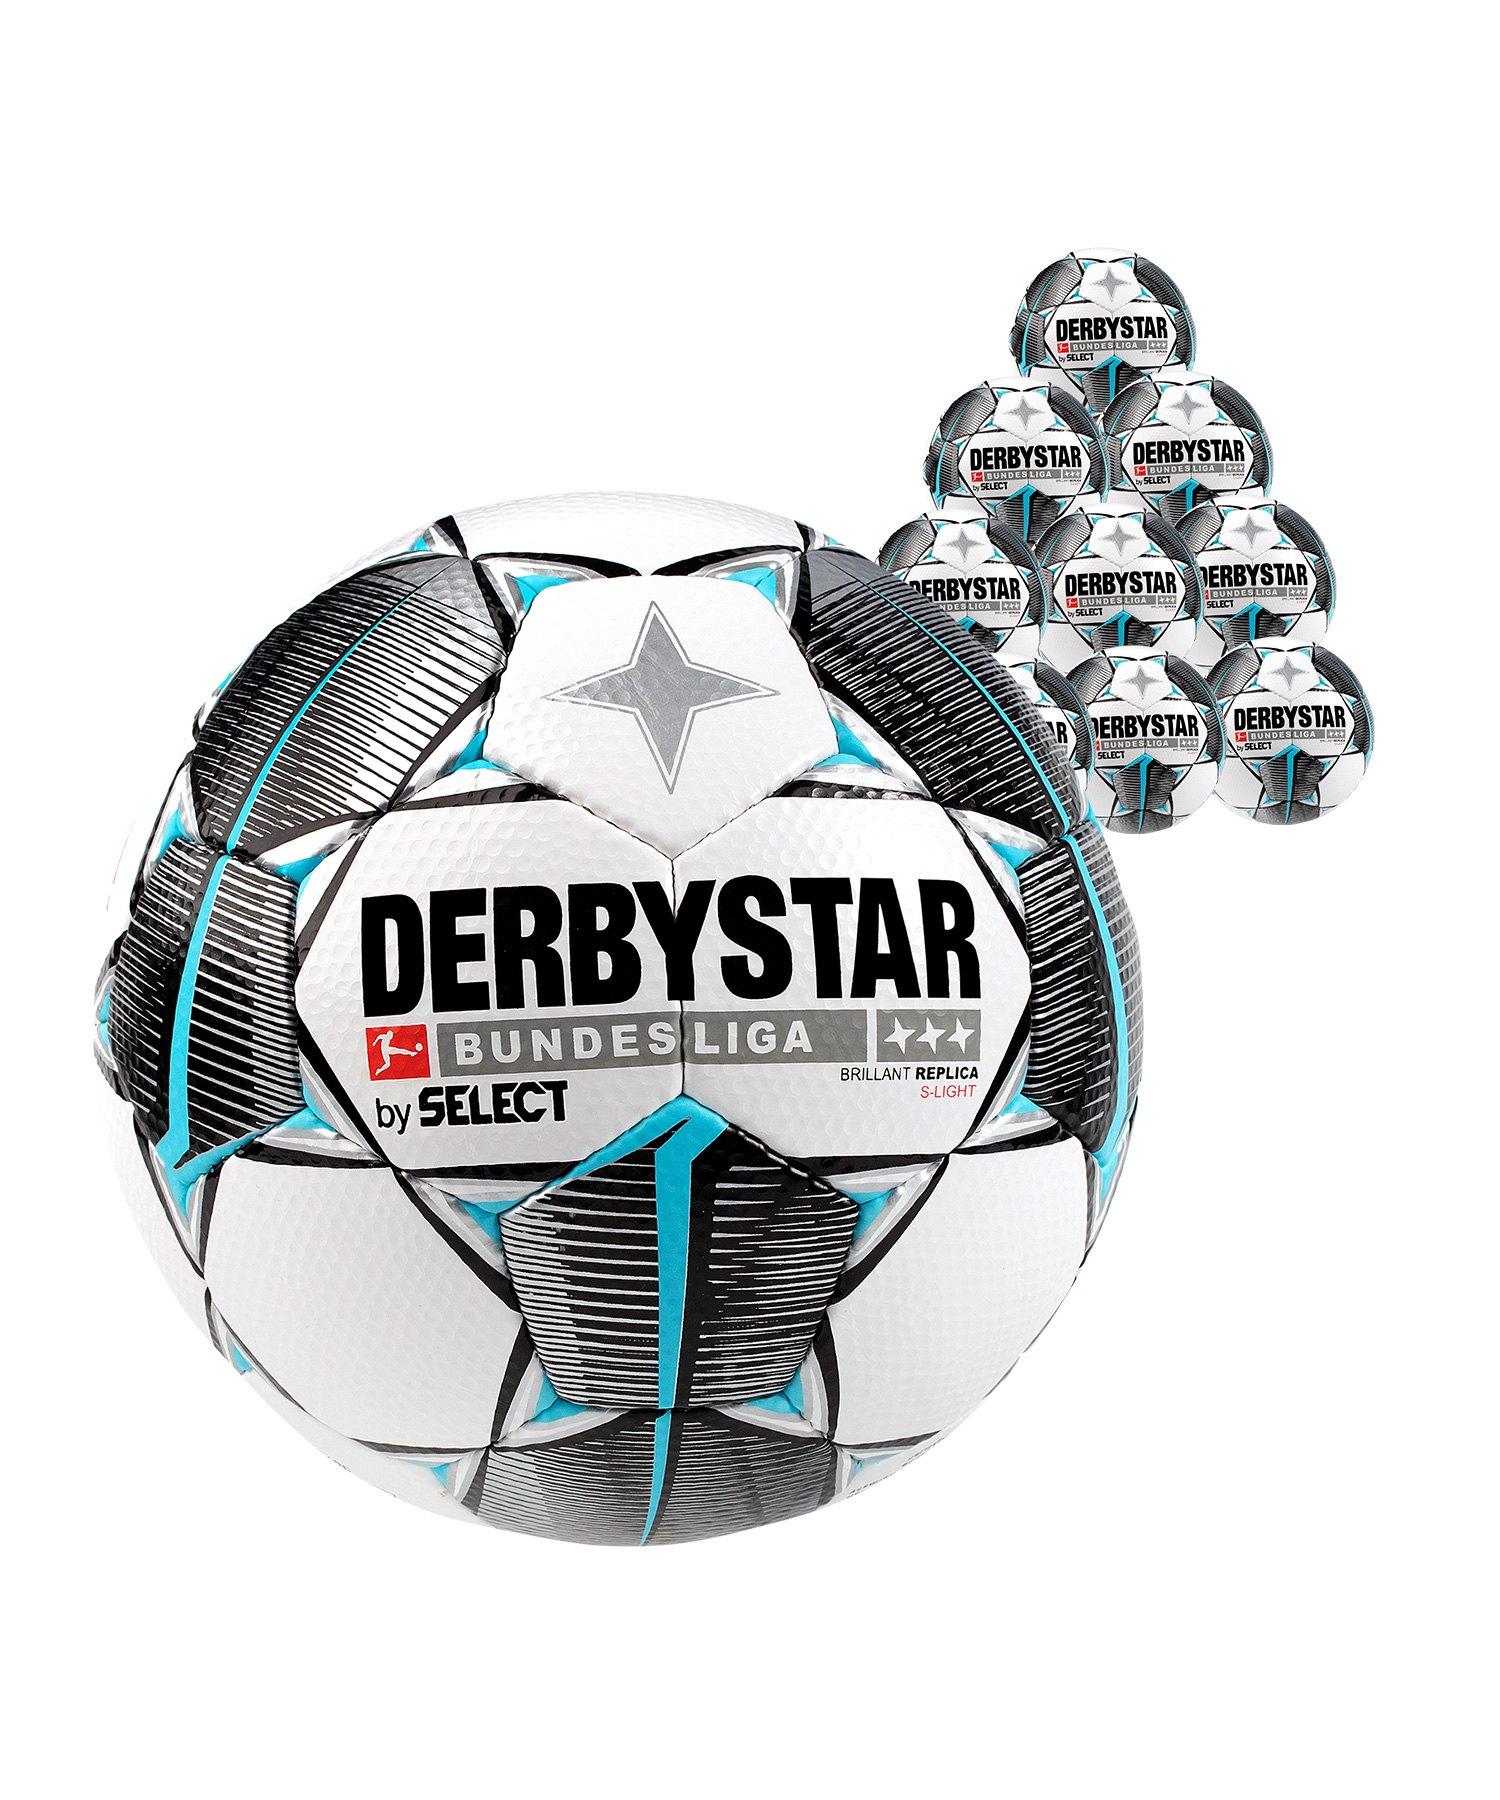 Derbystar Bundesliga Bril Replica S-Light 50x Gr.3 Weiss F019 - weiss